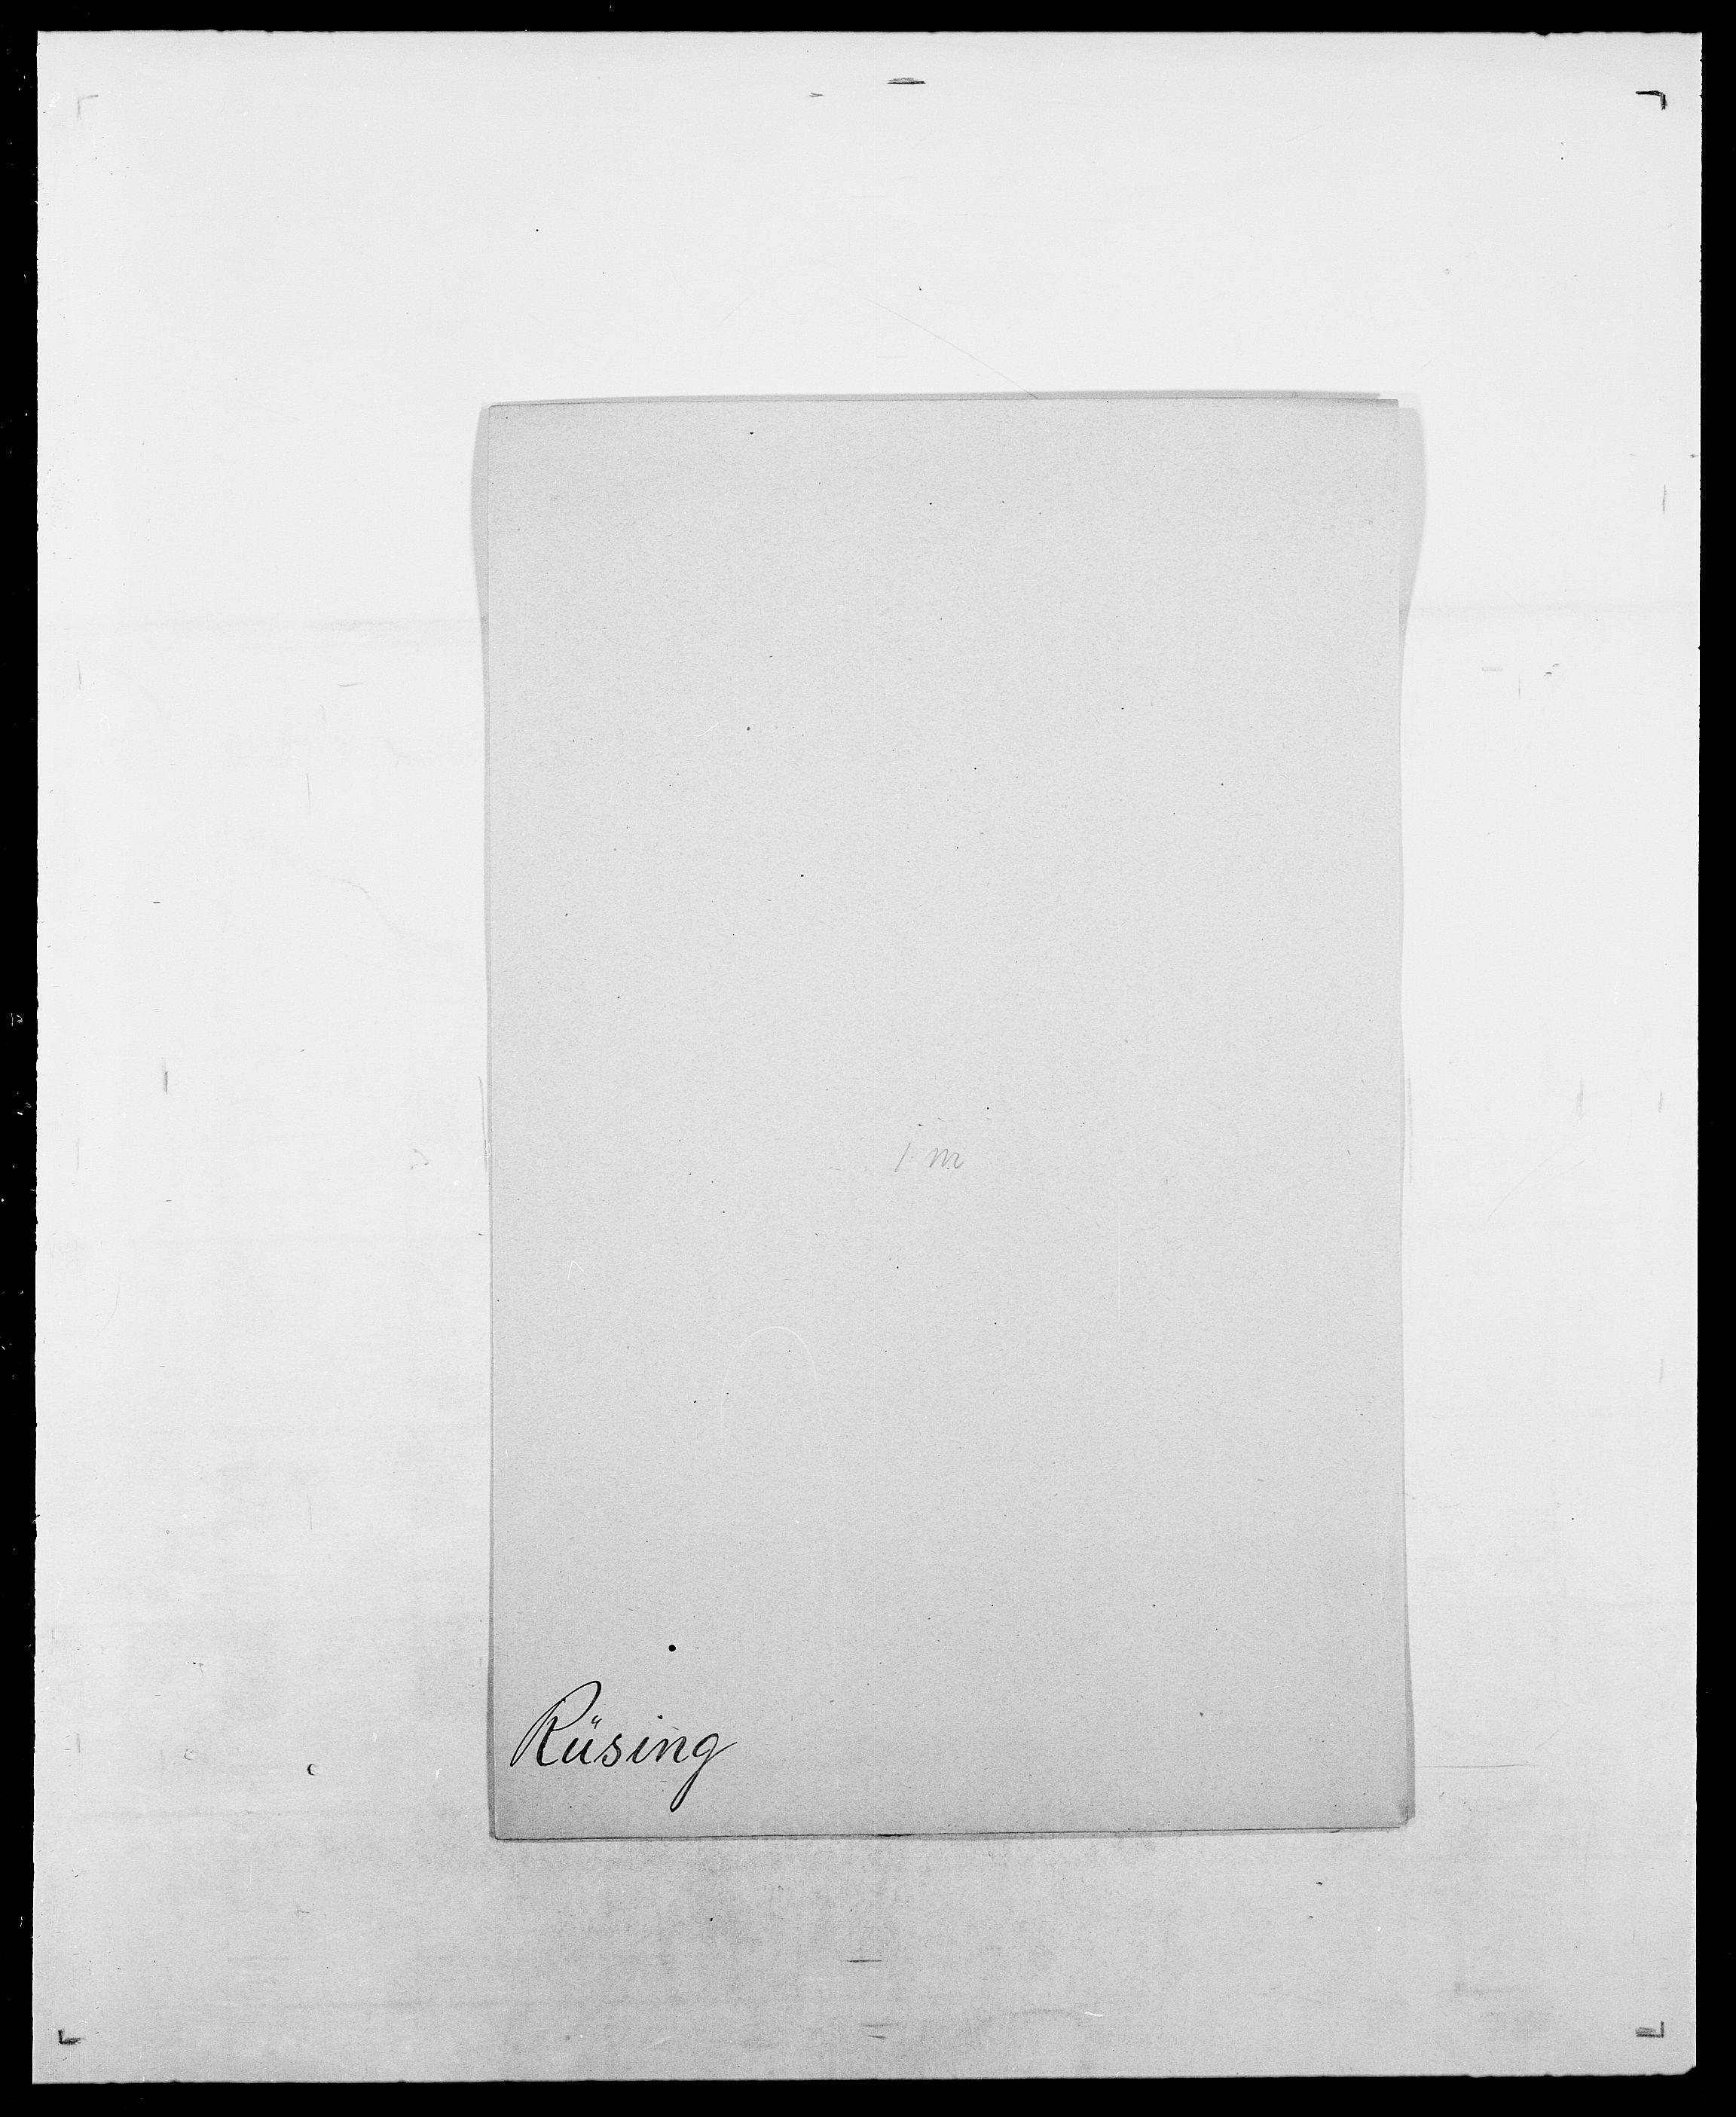 SAO, Delgobe, Charles Antoine - samling, D/Da/L0033: Roald - Røyem, s. 586